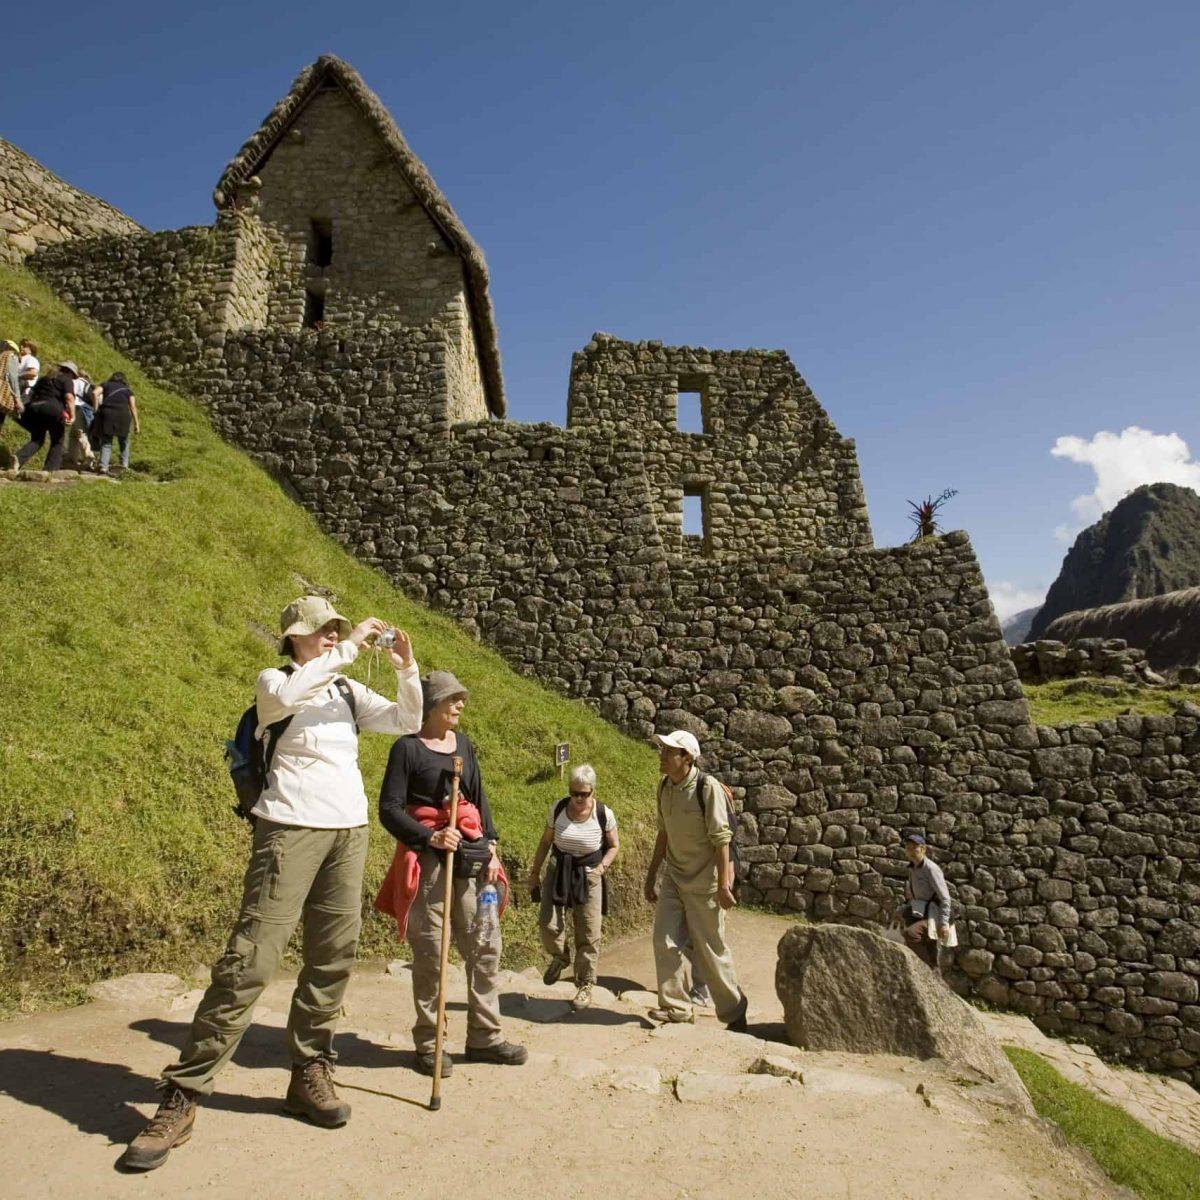 Turistas en la ciudadela de Machu Picchu.